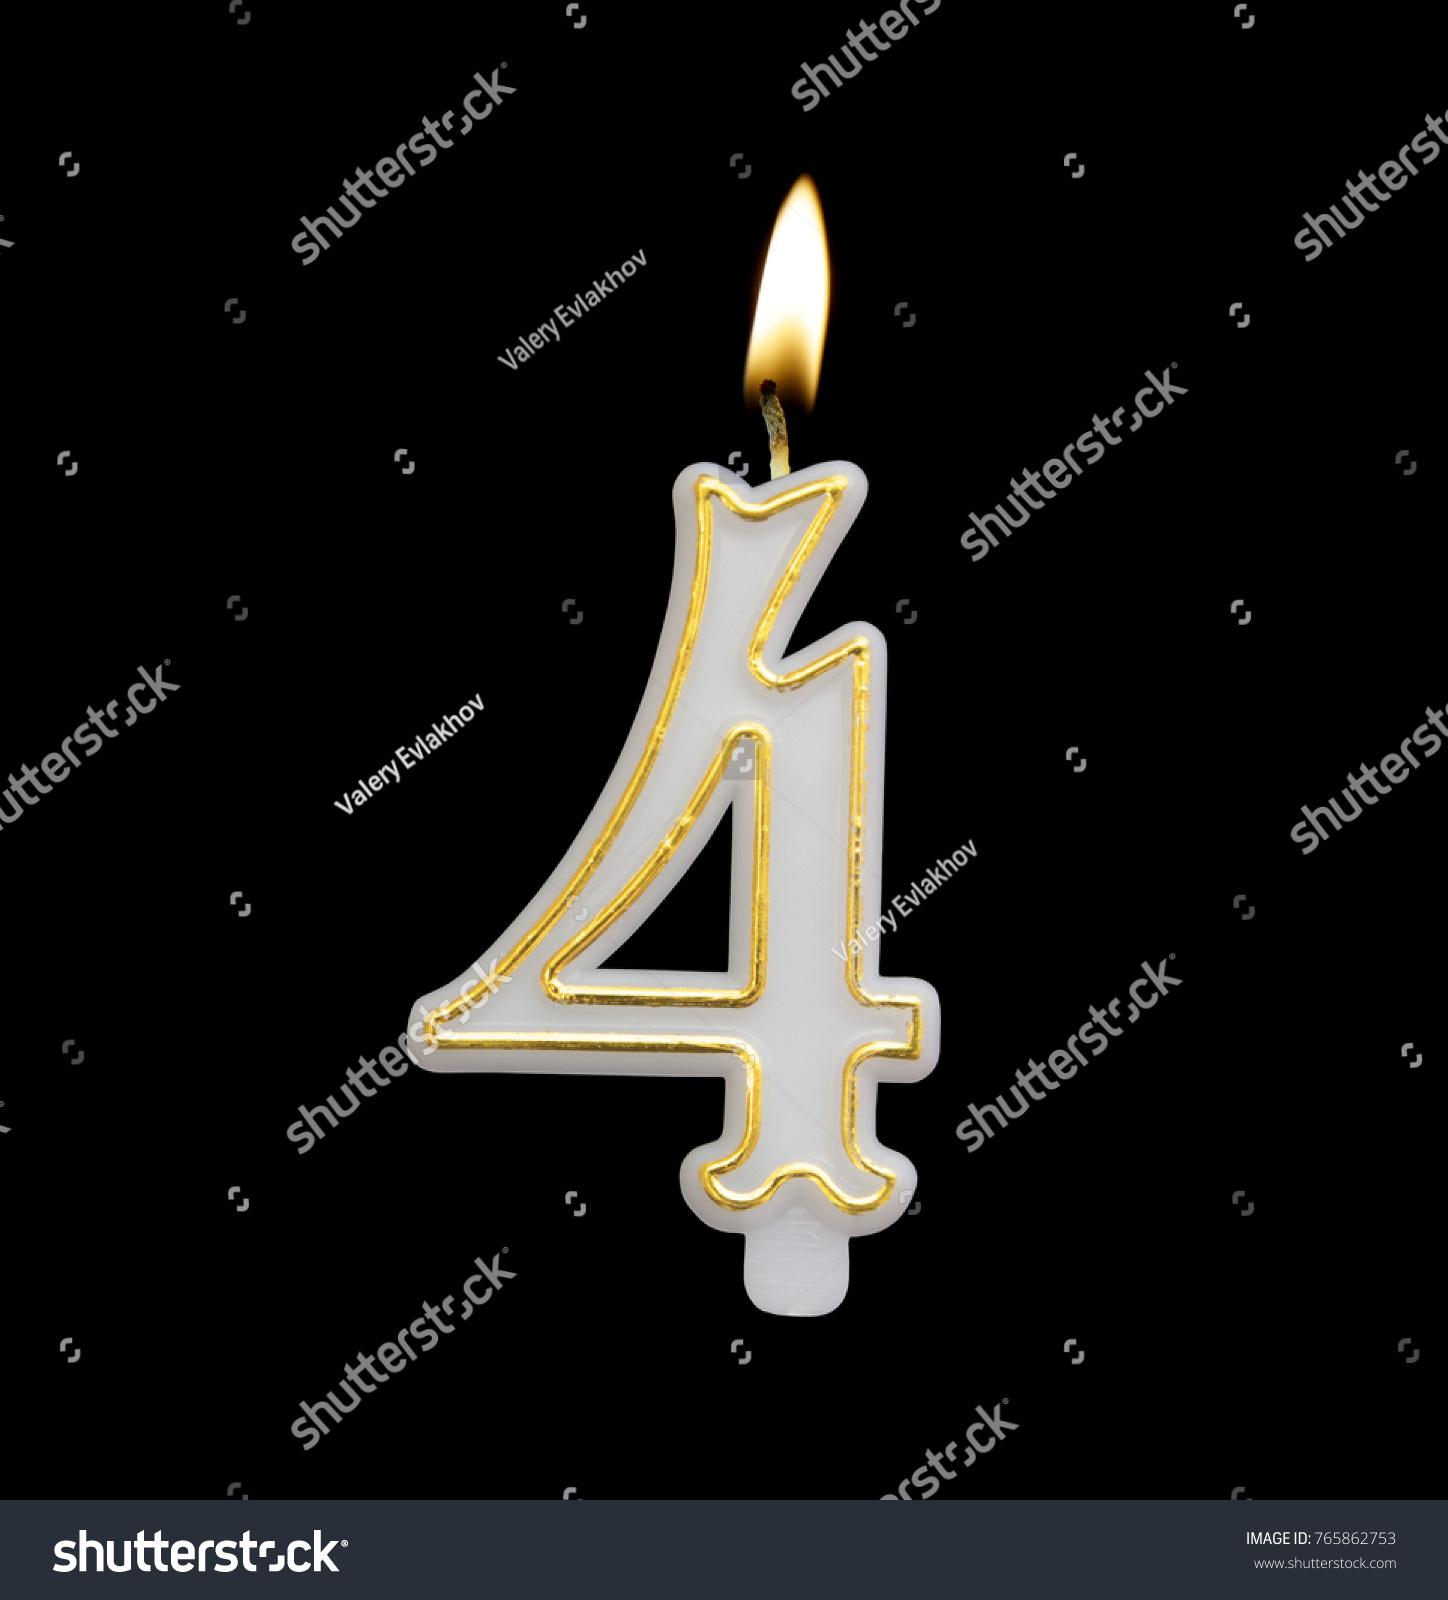 Burning Birthday Candle Isolated On Black Background Number 4